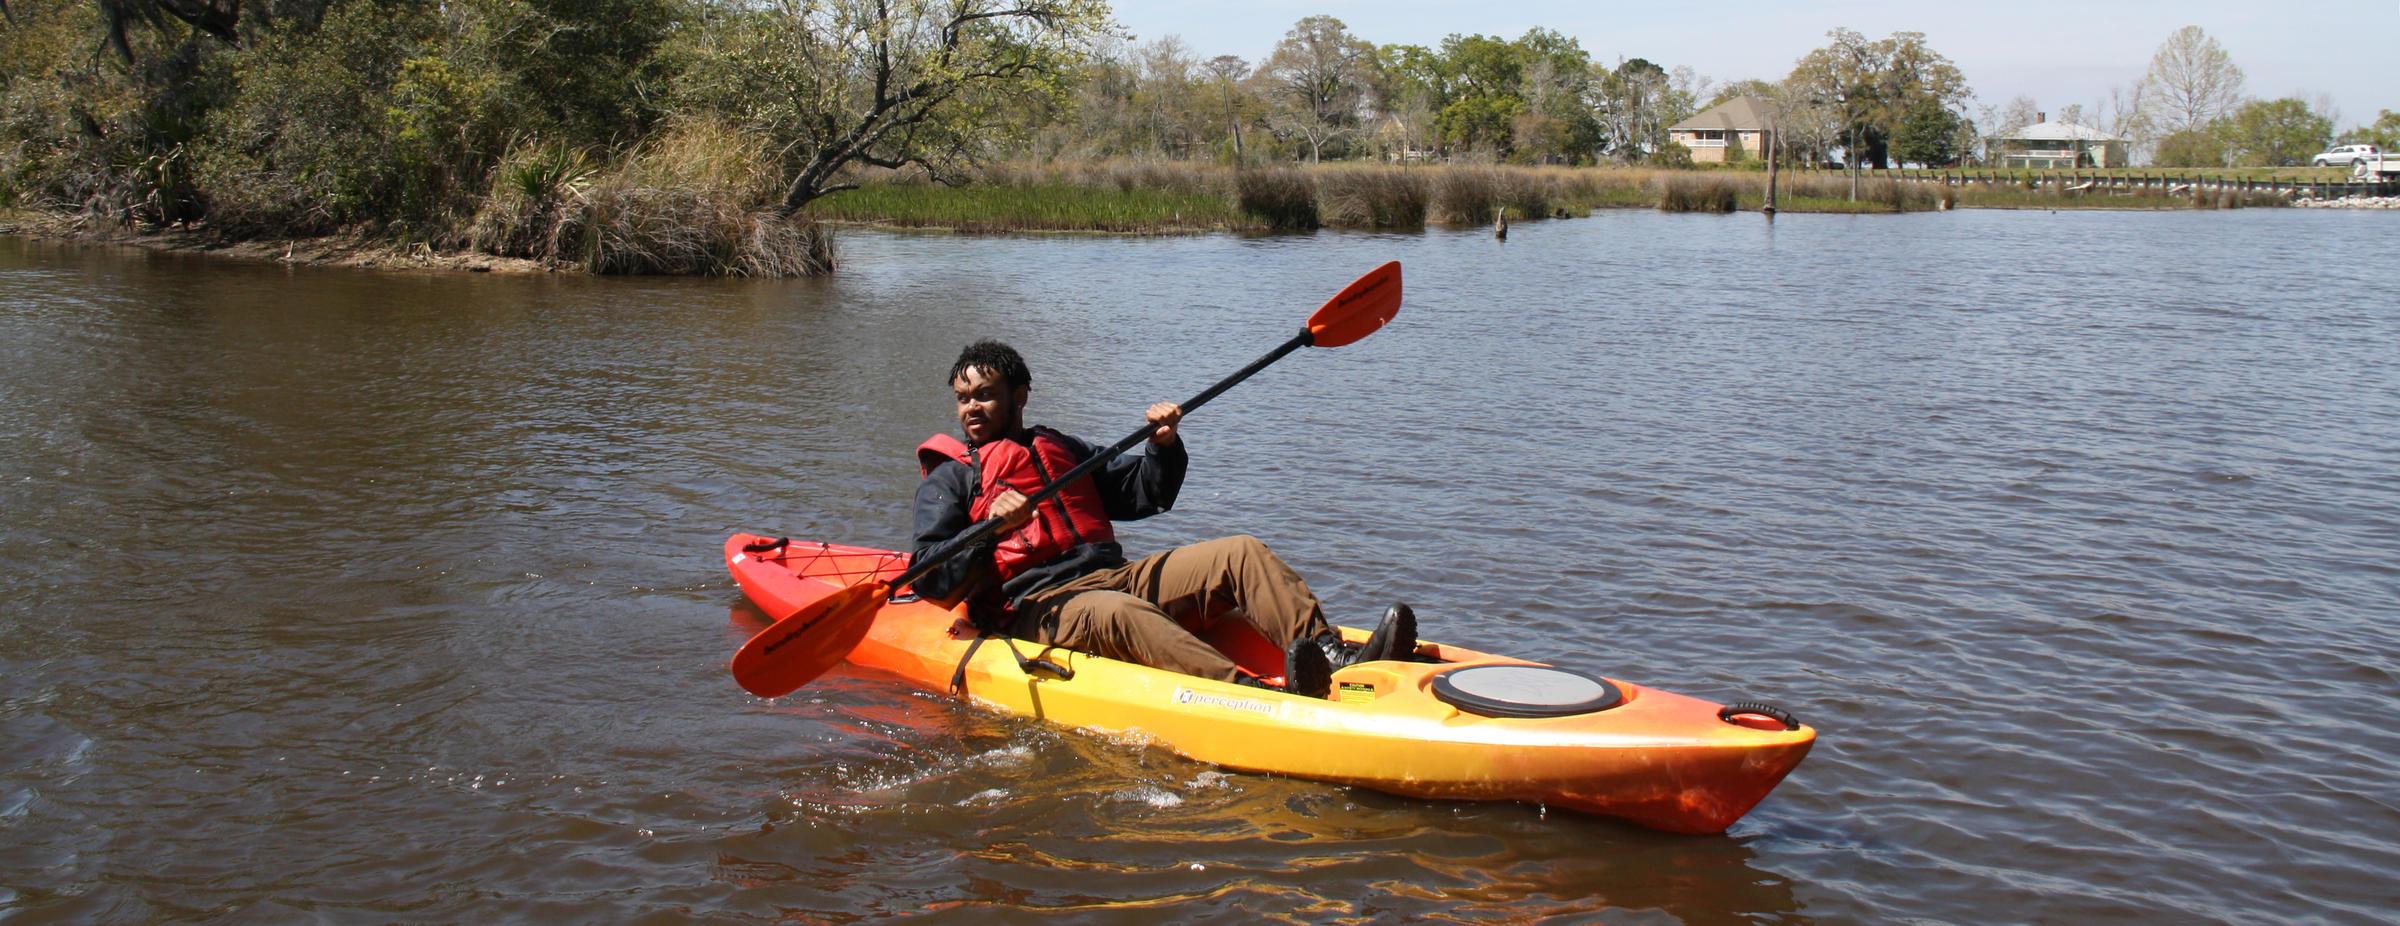 Man kayaks the bayou